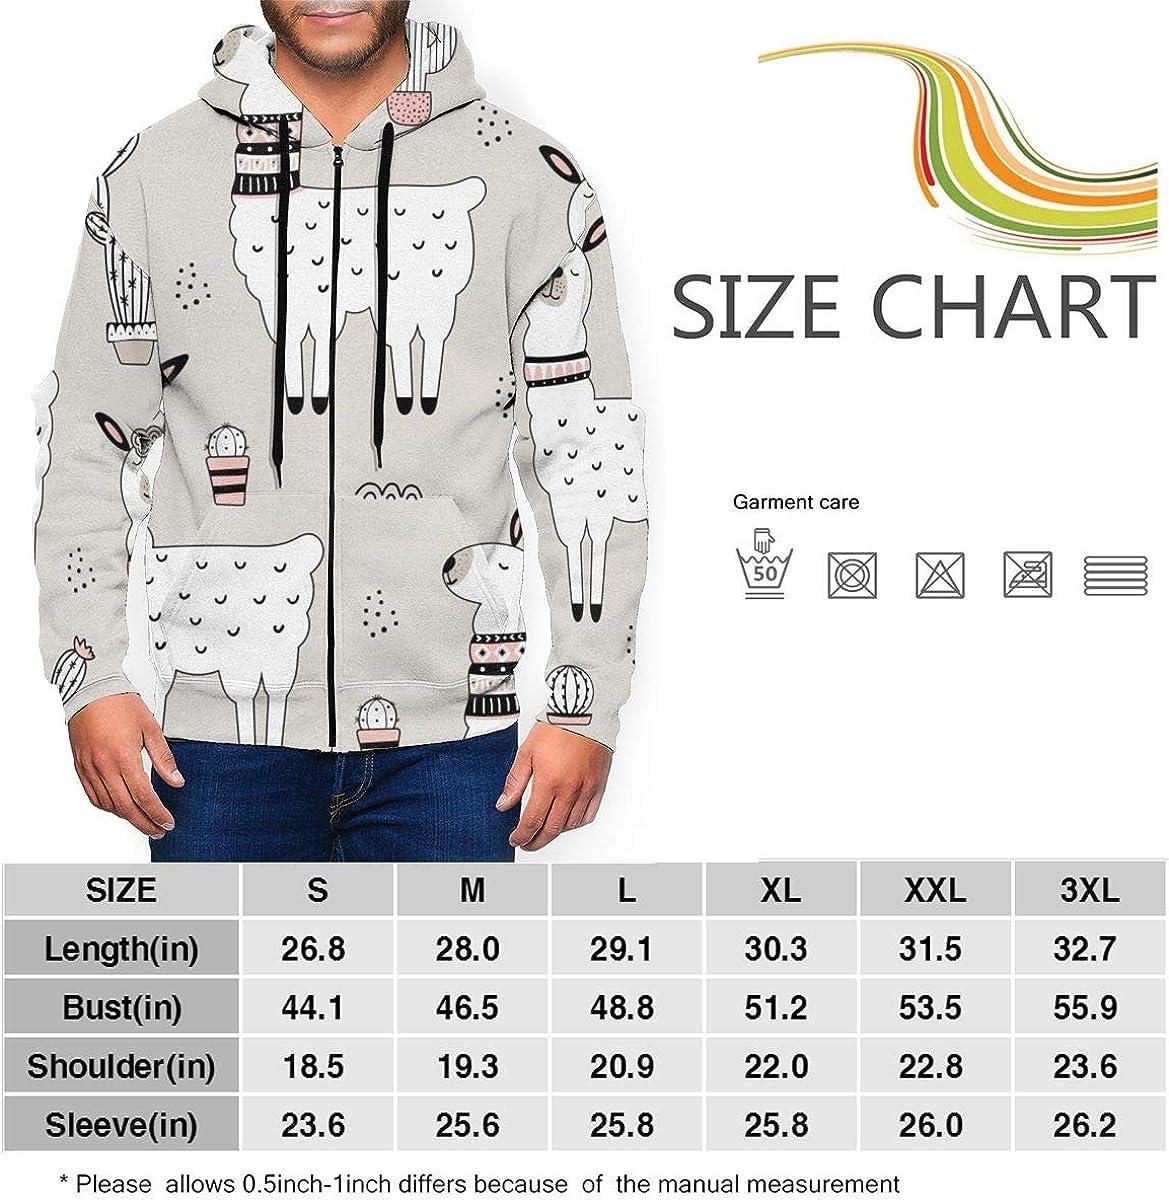 KAMQUERENCE Mens Zipper Hoodies Sweatshirt Long Sleeve Coat with Pockets Seamless Pattern with Llama